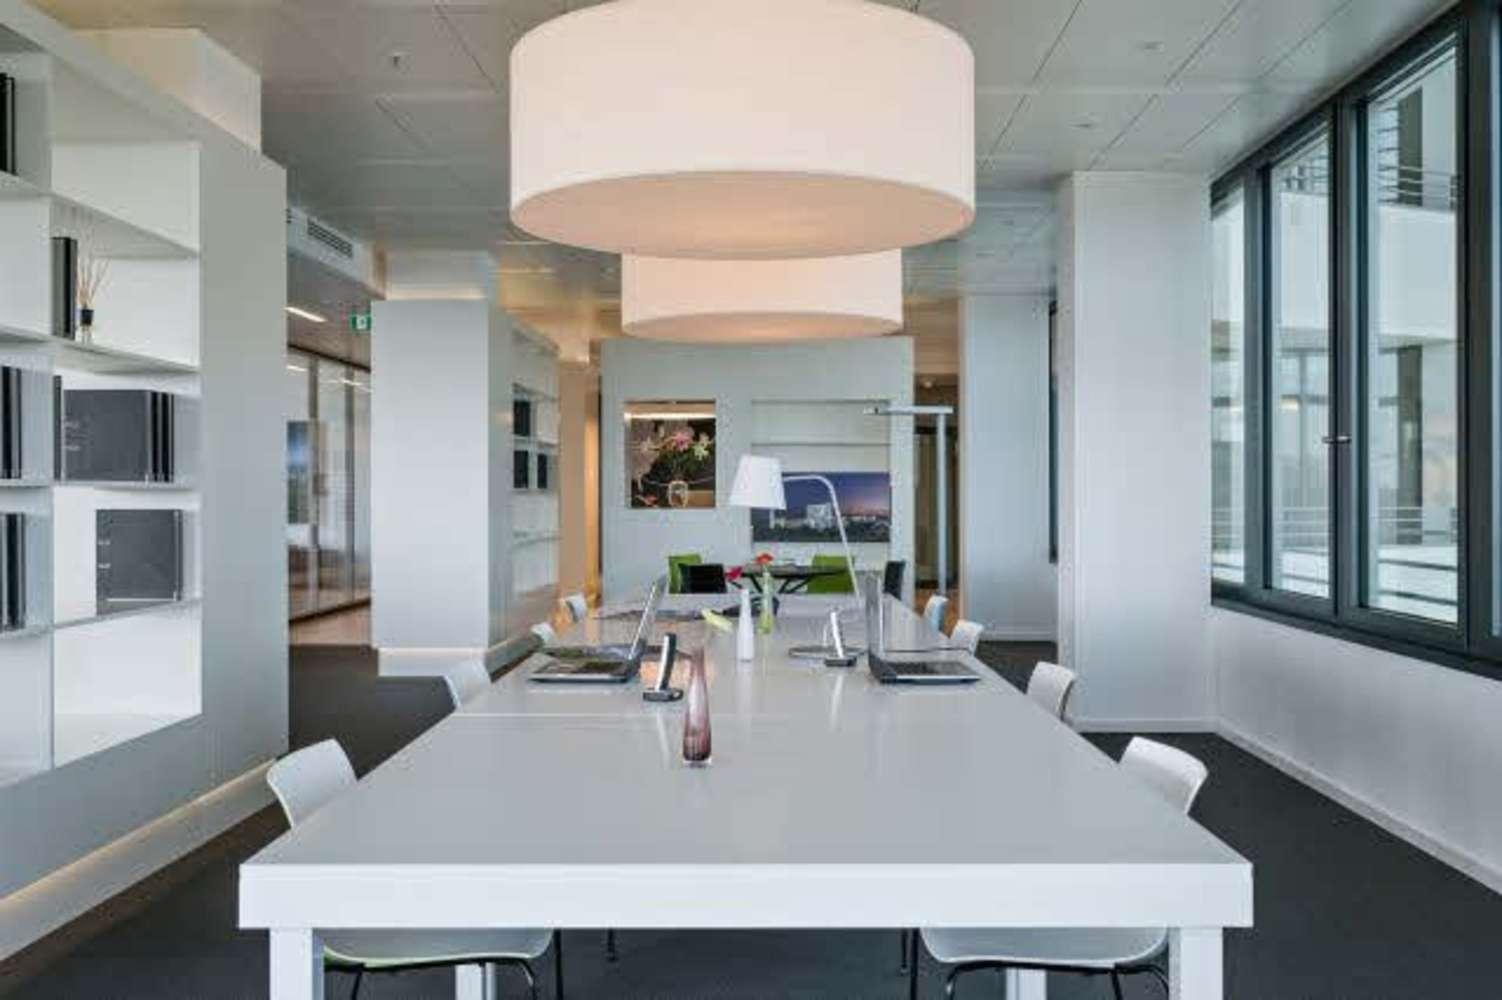 Büros Frankfurt am main, 60549 - Büro - Frankfurt am Main, Flughafen - F1273 - 9839548